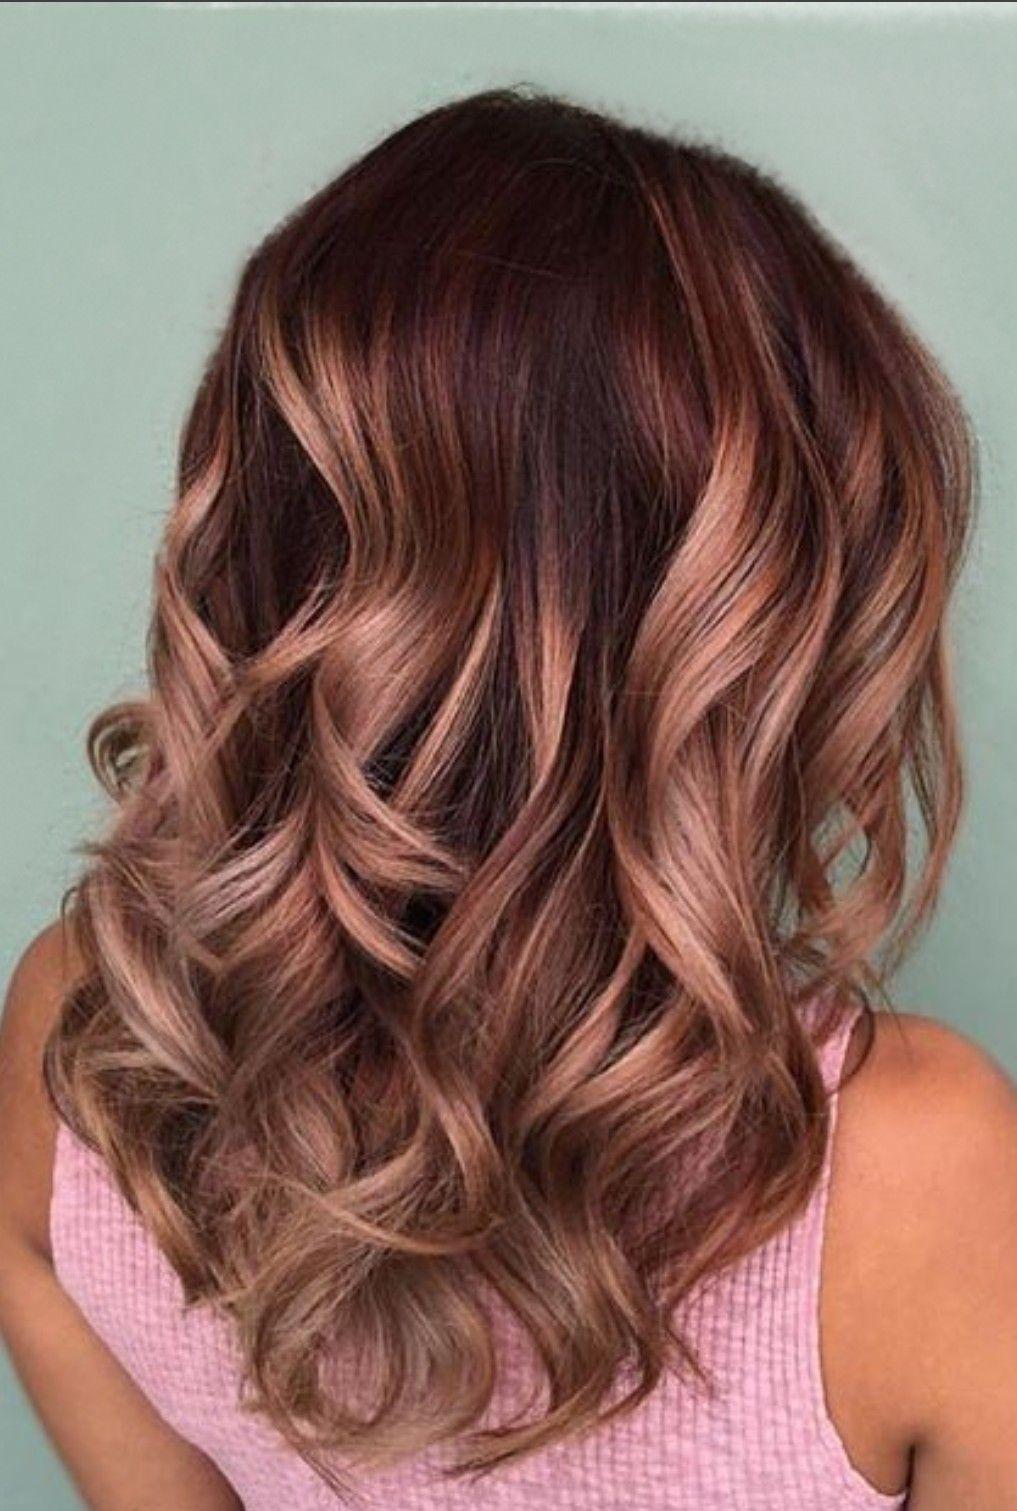 41+ Rose brown hair color ideas ideas in 2021